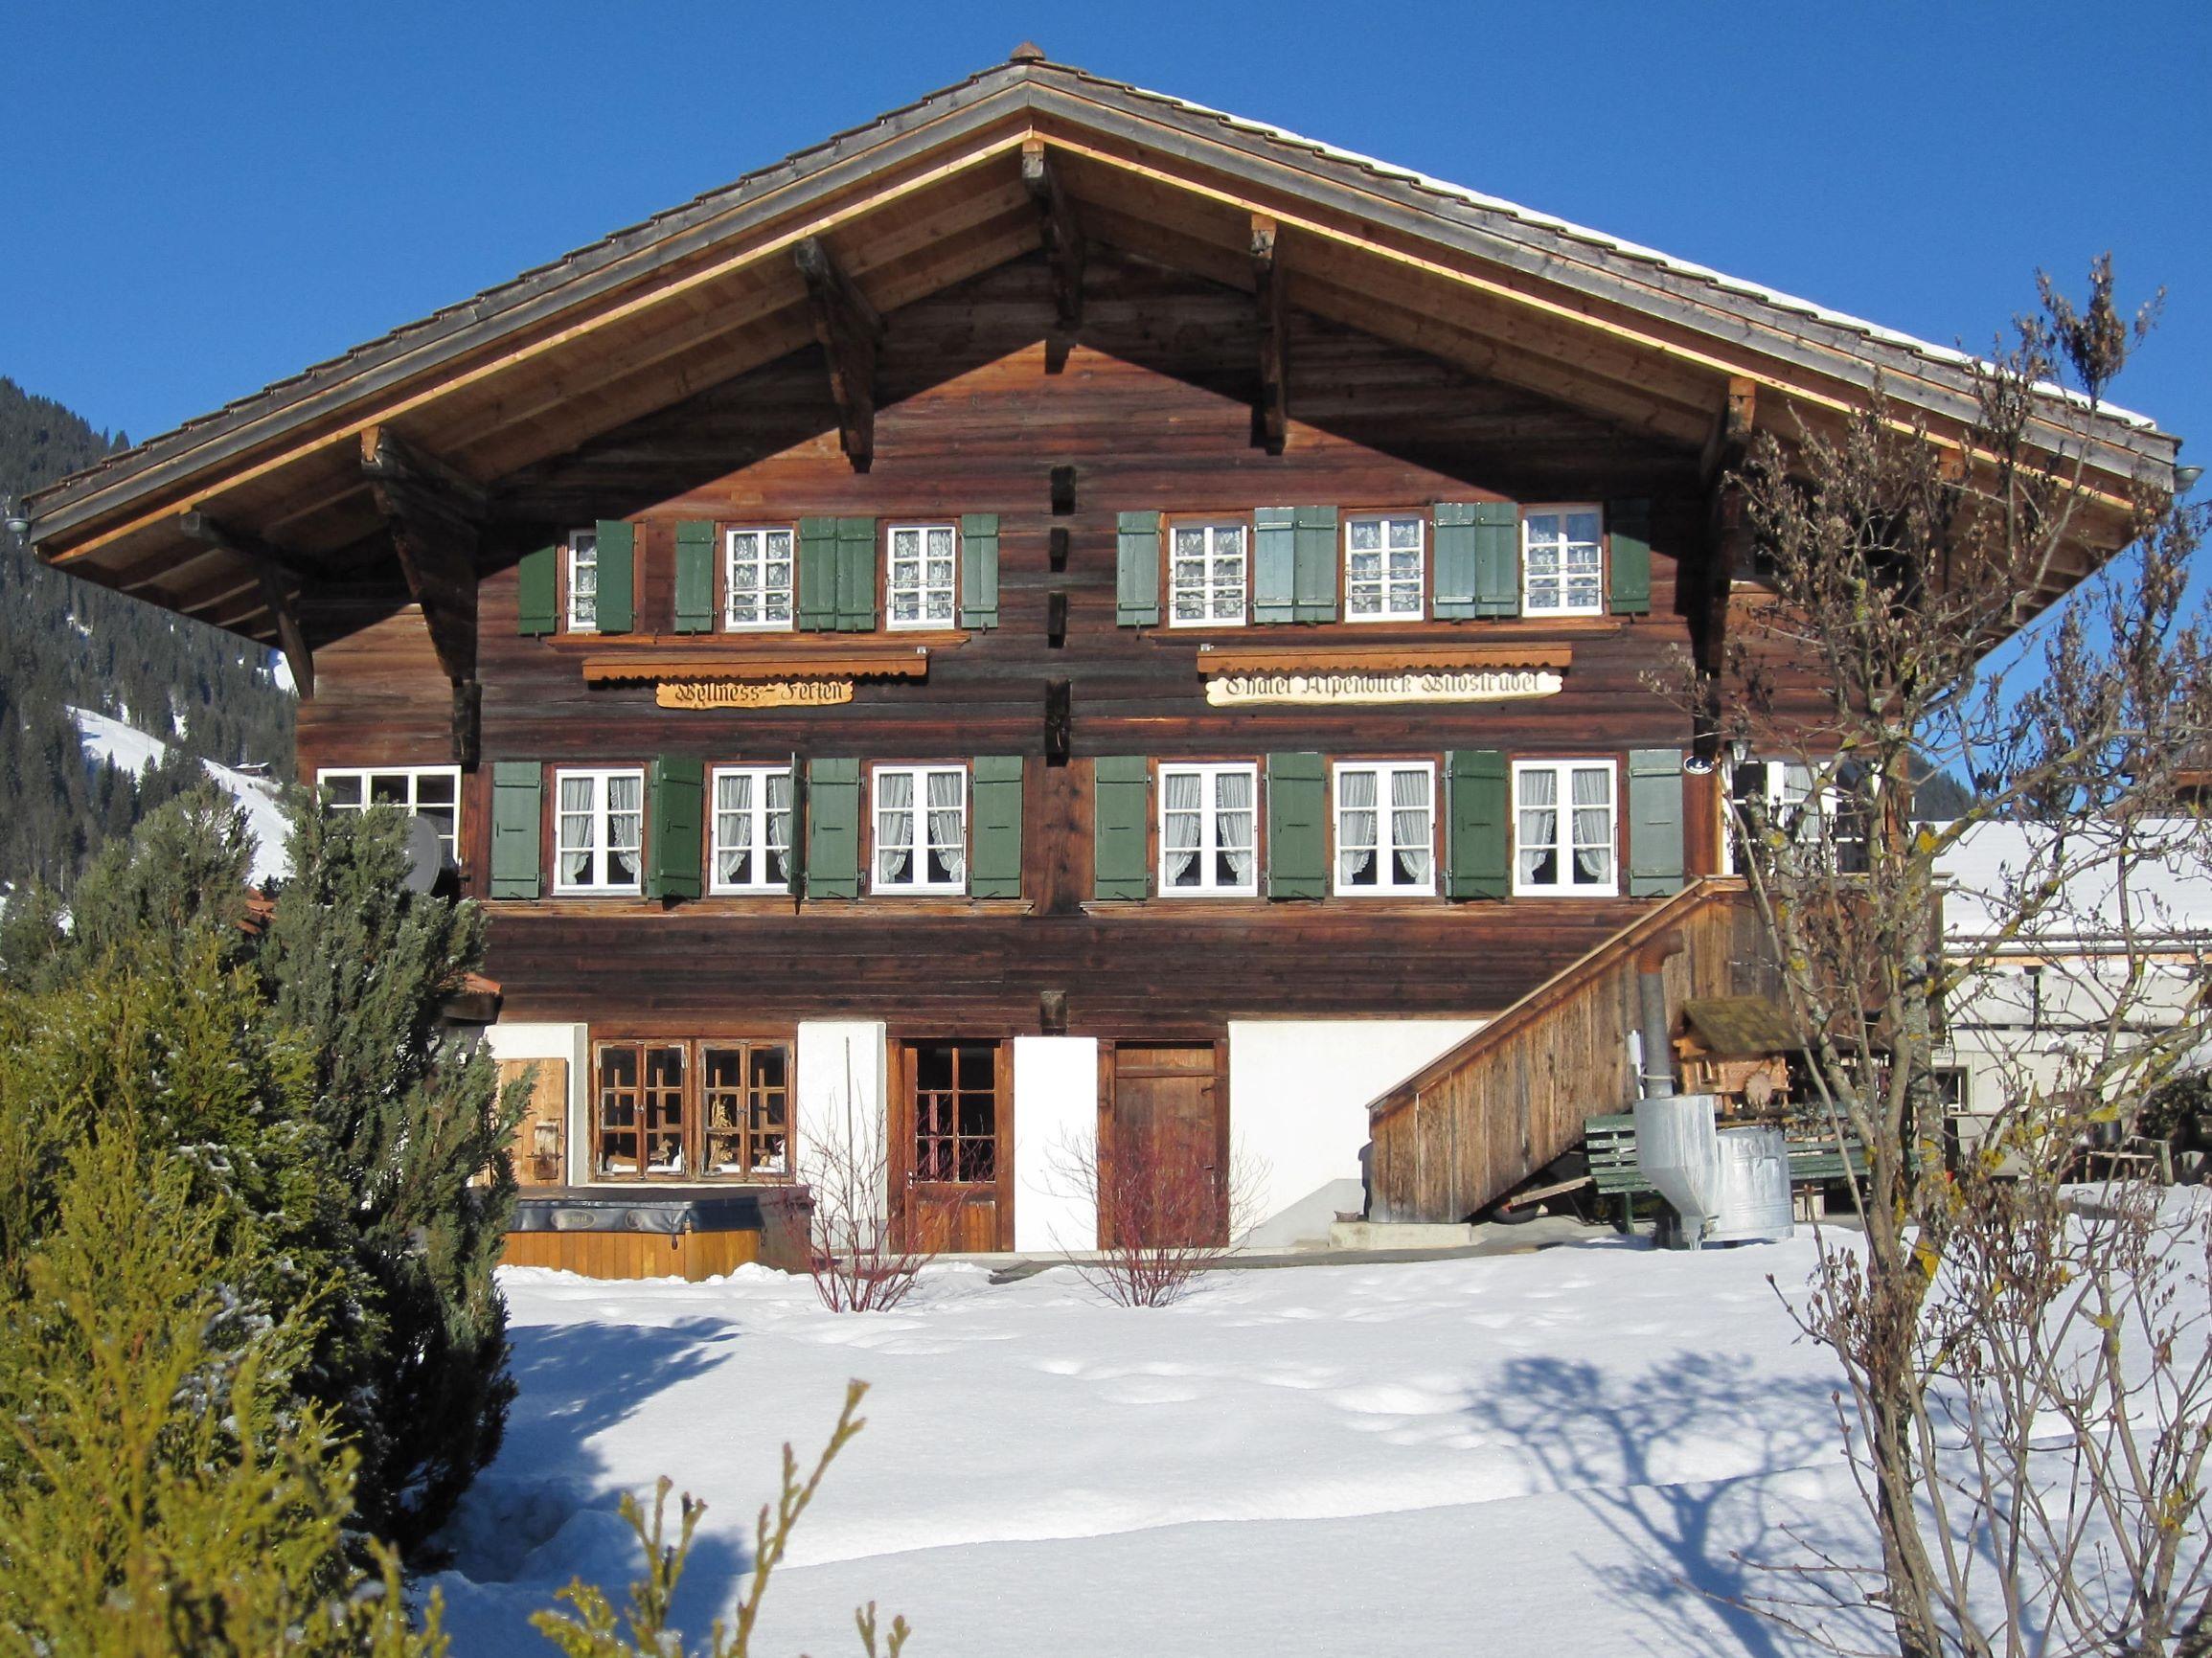 Chalet-Hotel Alpenblick Wildstrubel 0